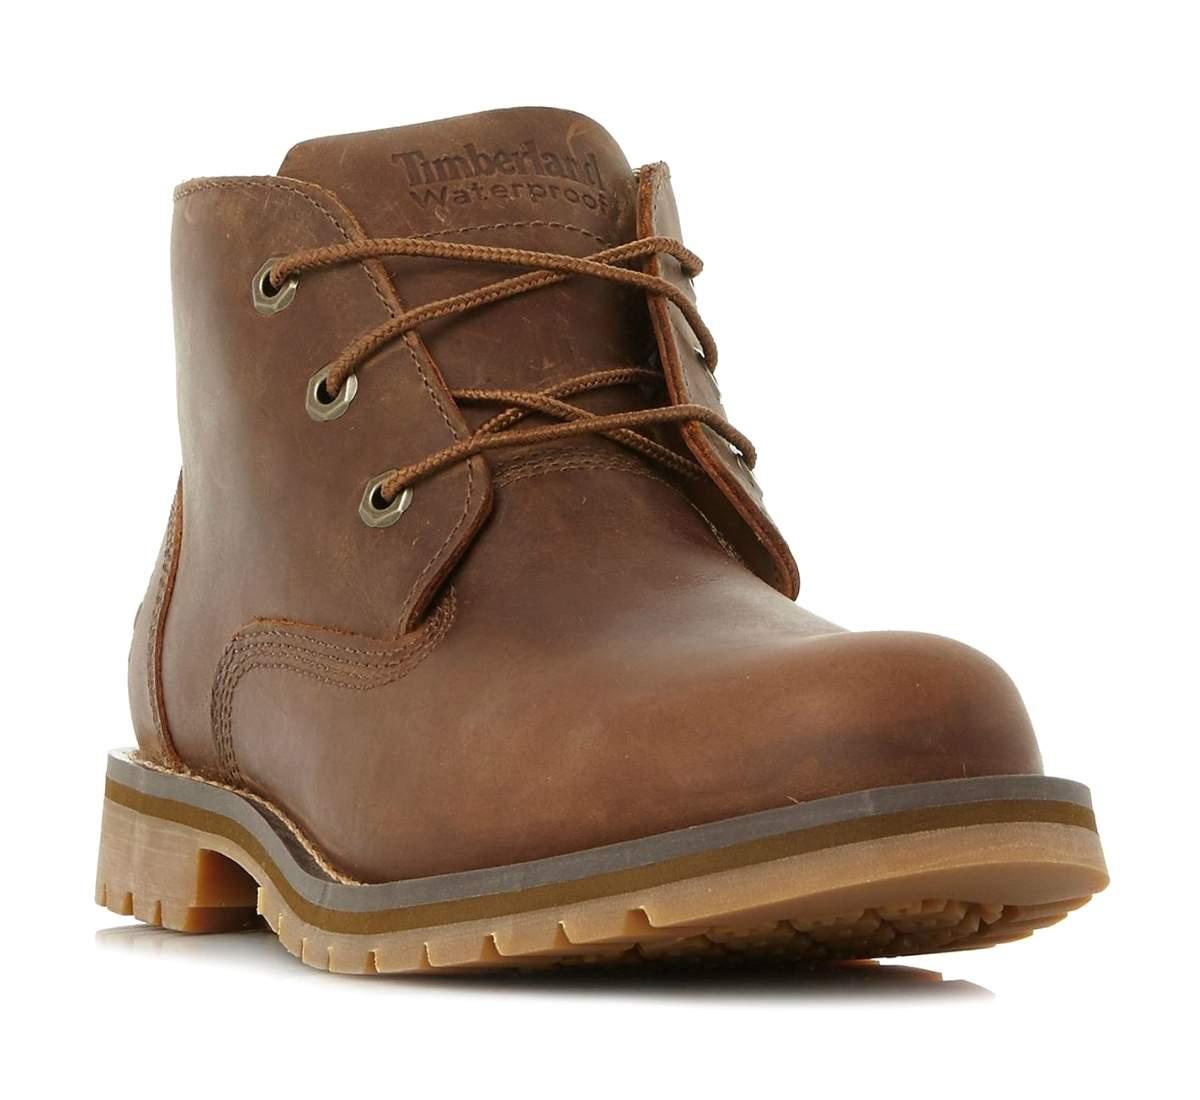 sports shoes 8651c de7e4 Details zu Timberland Mens Brown 3 Eye Waterproof Leather Chukka Boots UK  11 EU 45.5